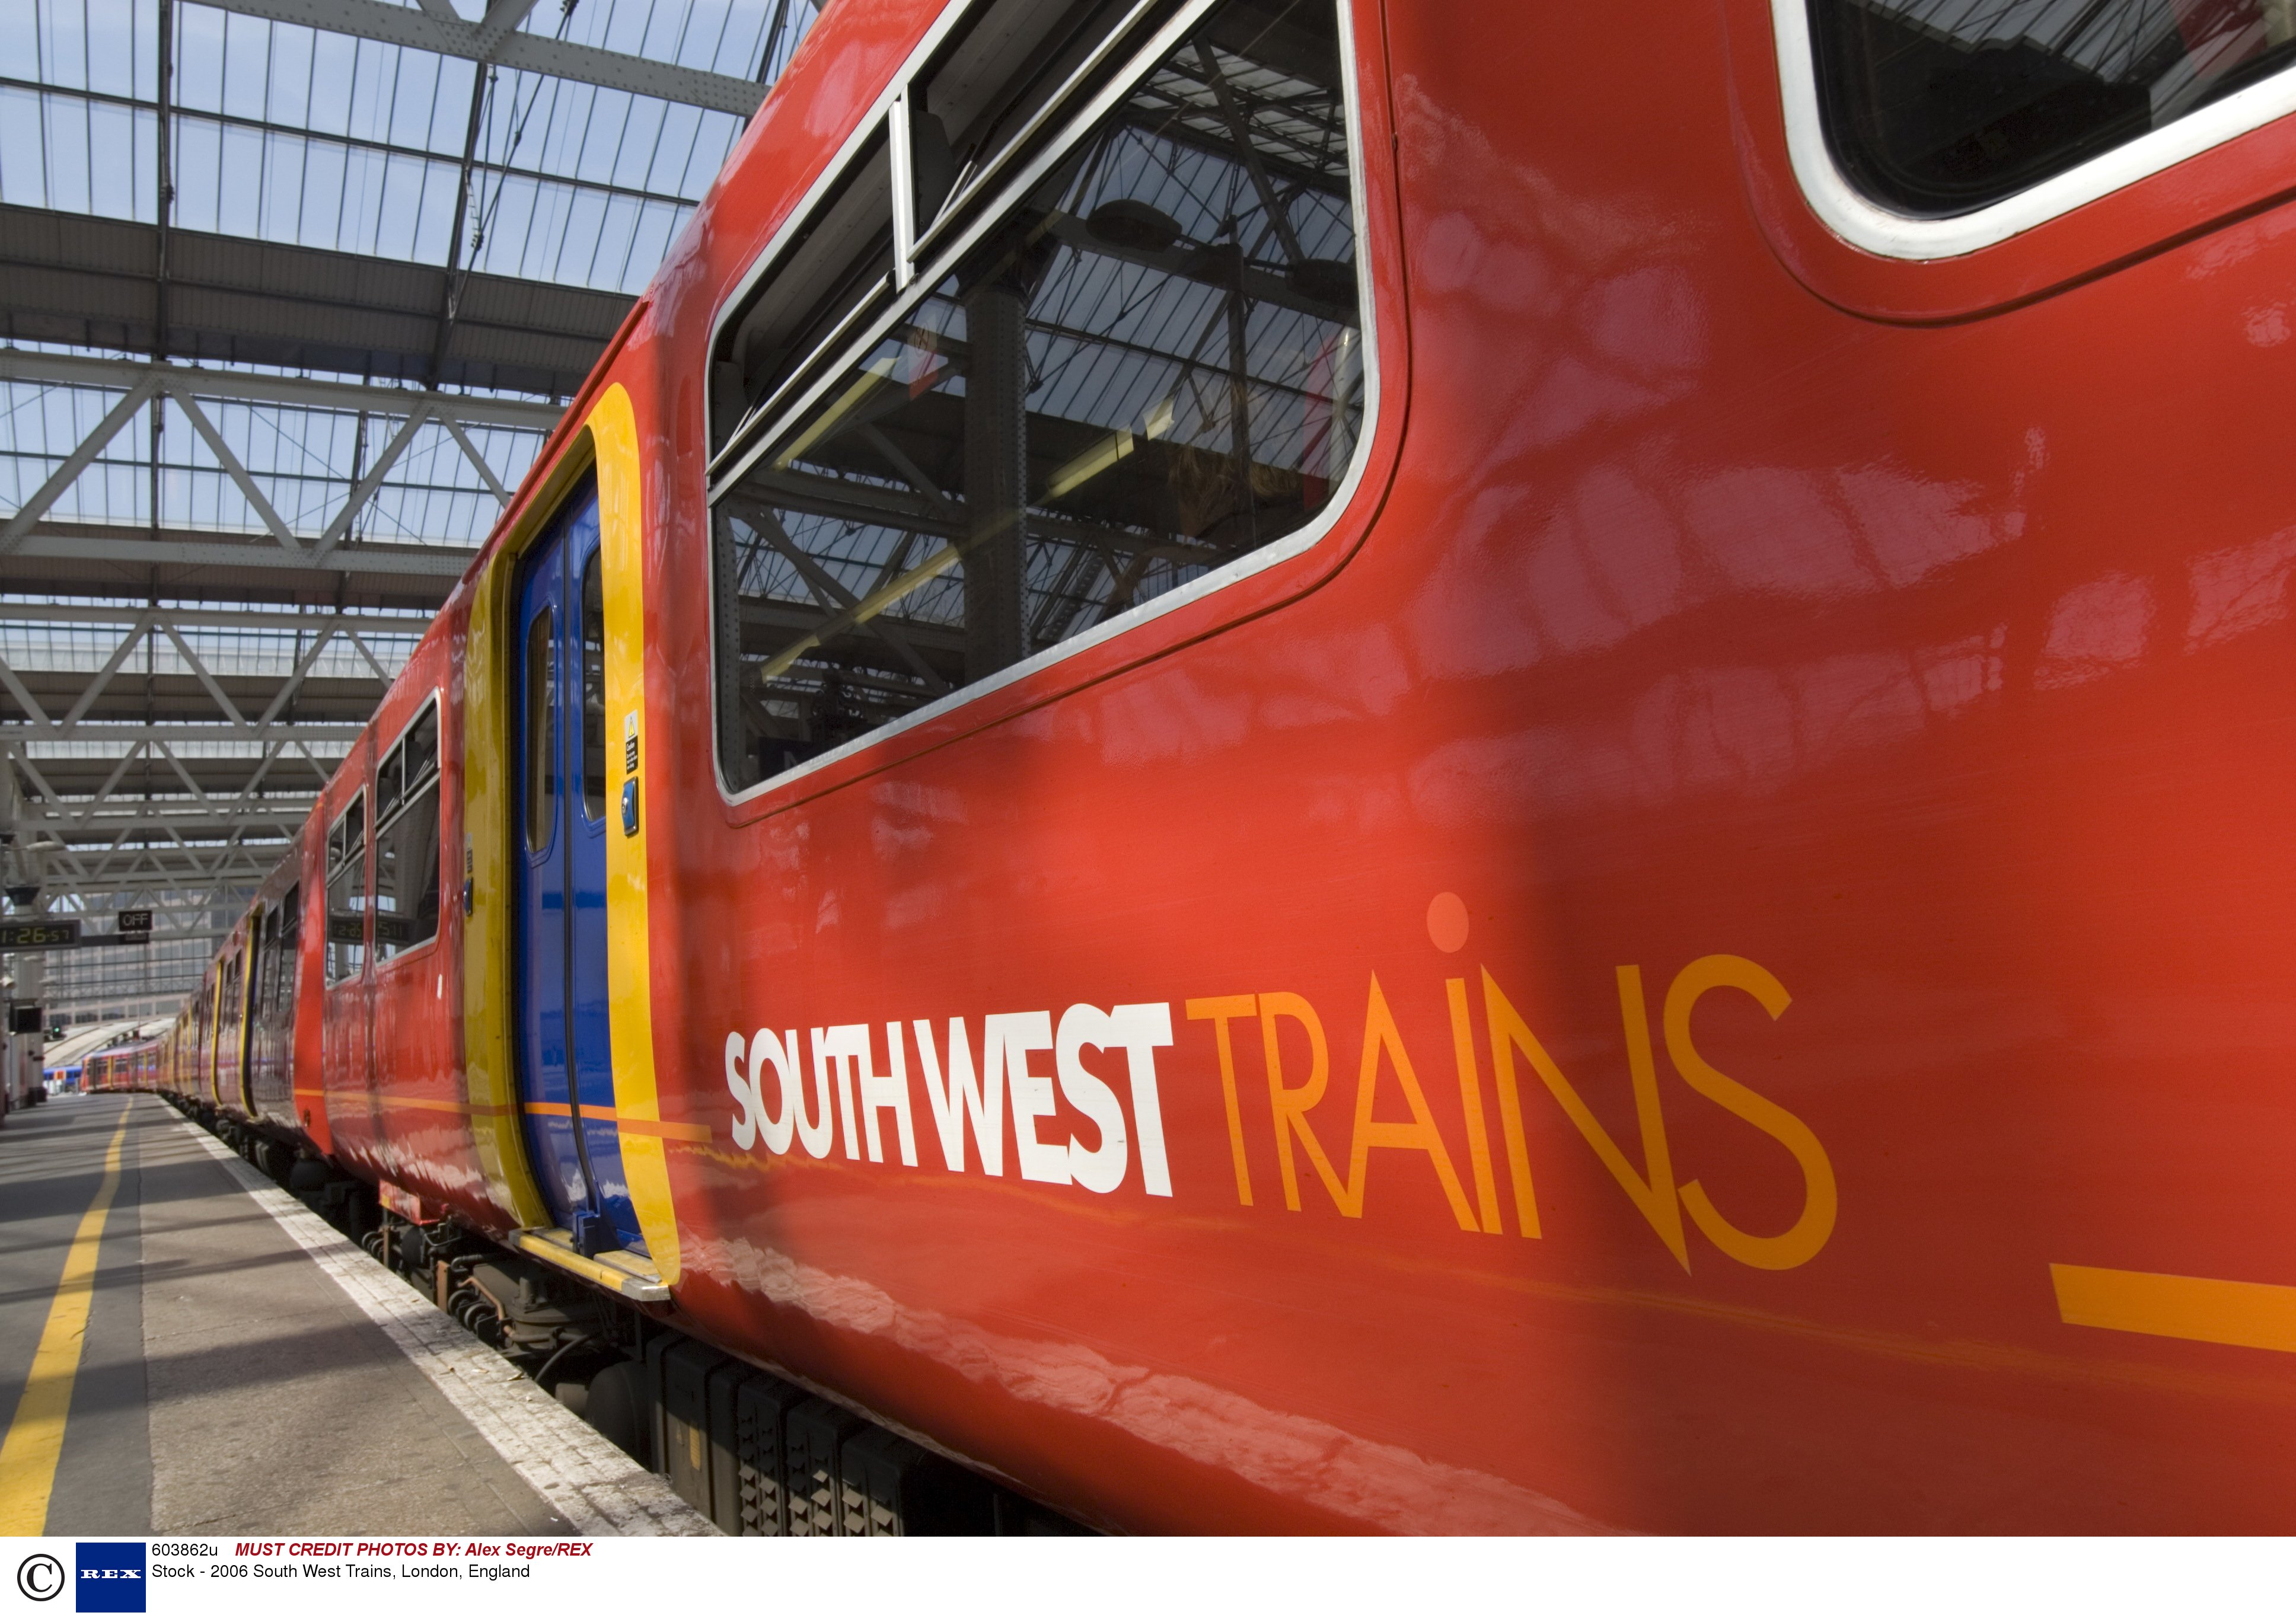 South West Trains. REX FEATURES